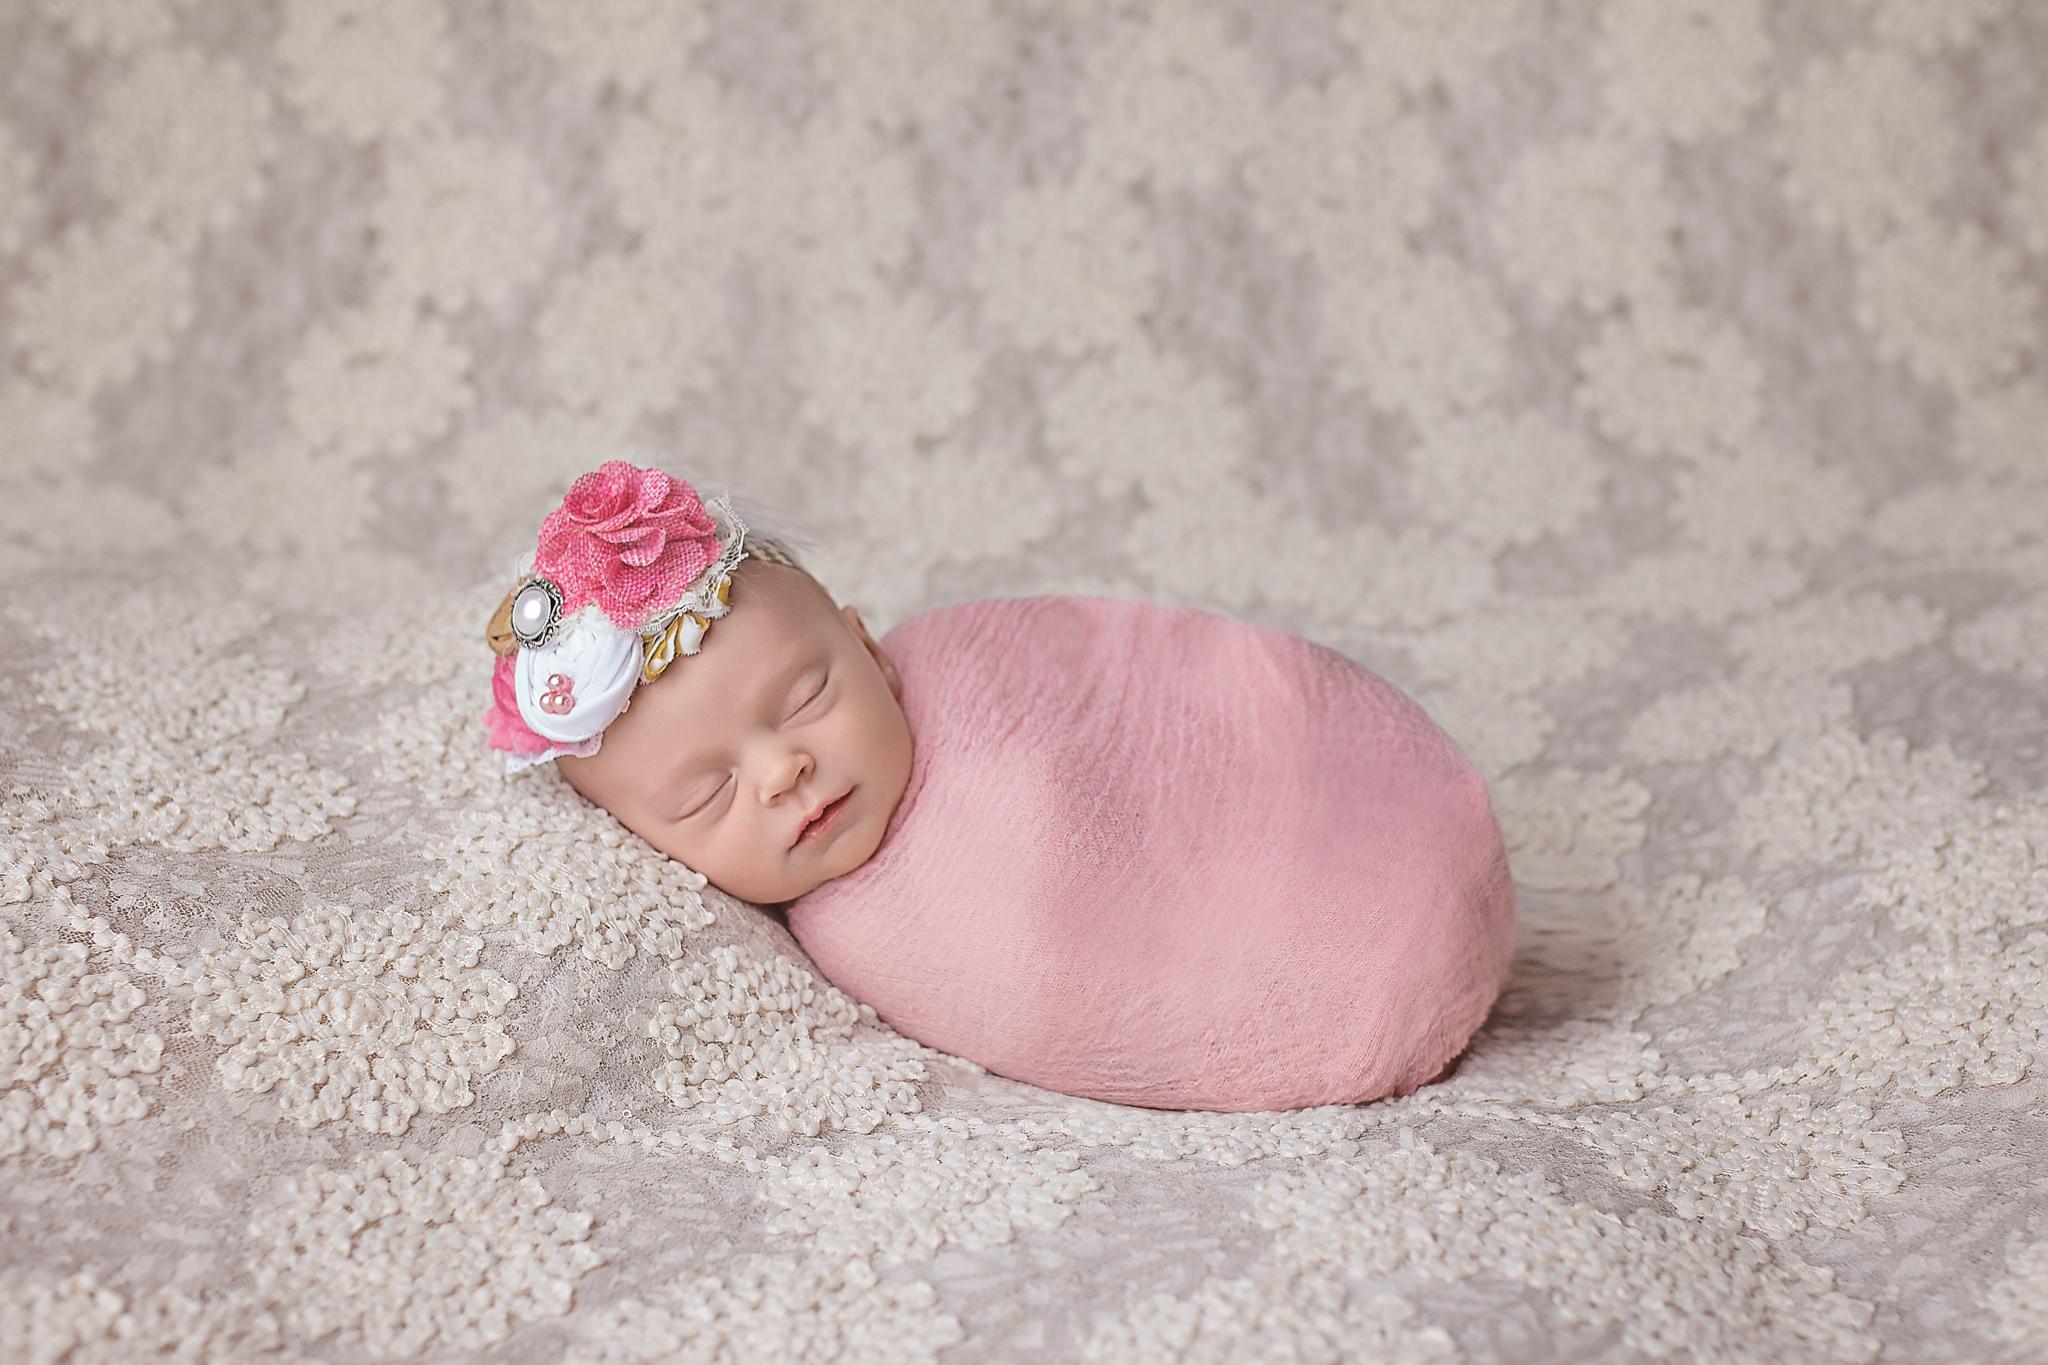 newborn girl on lace